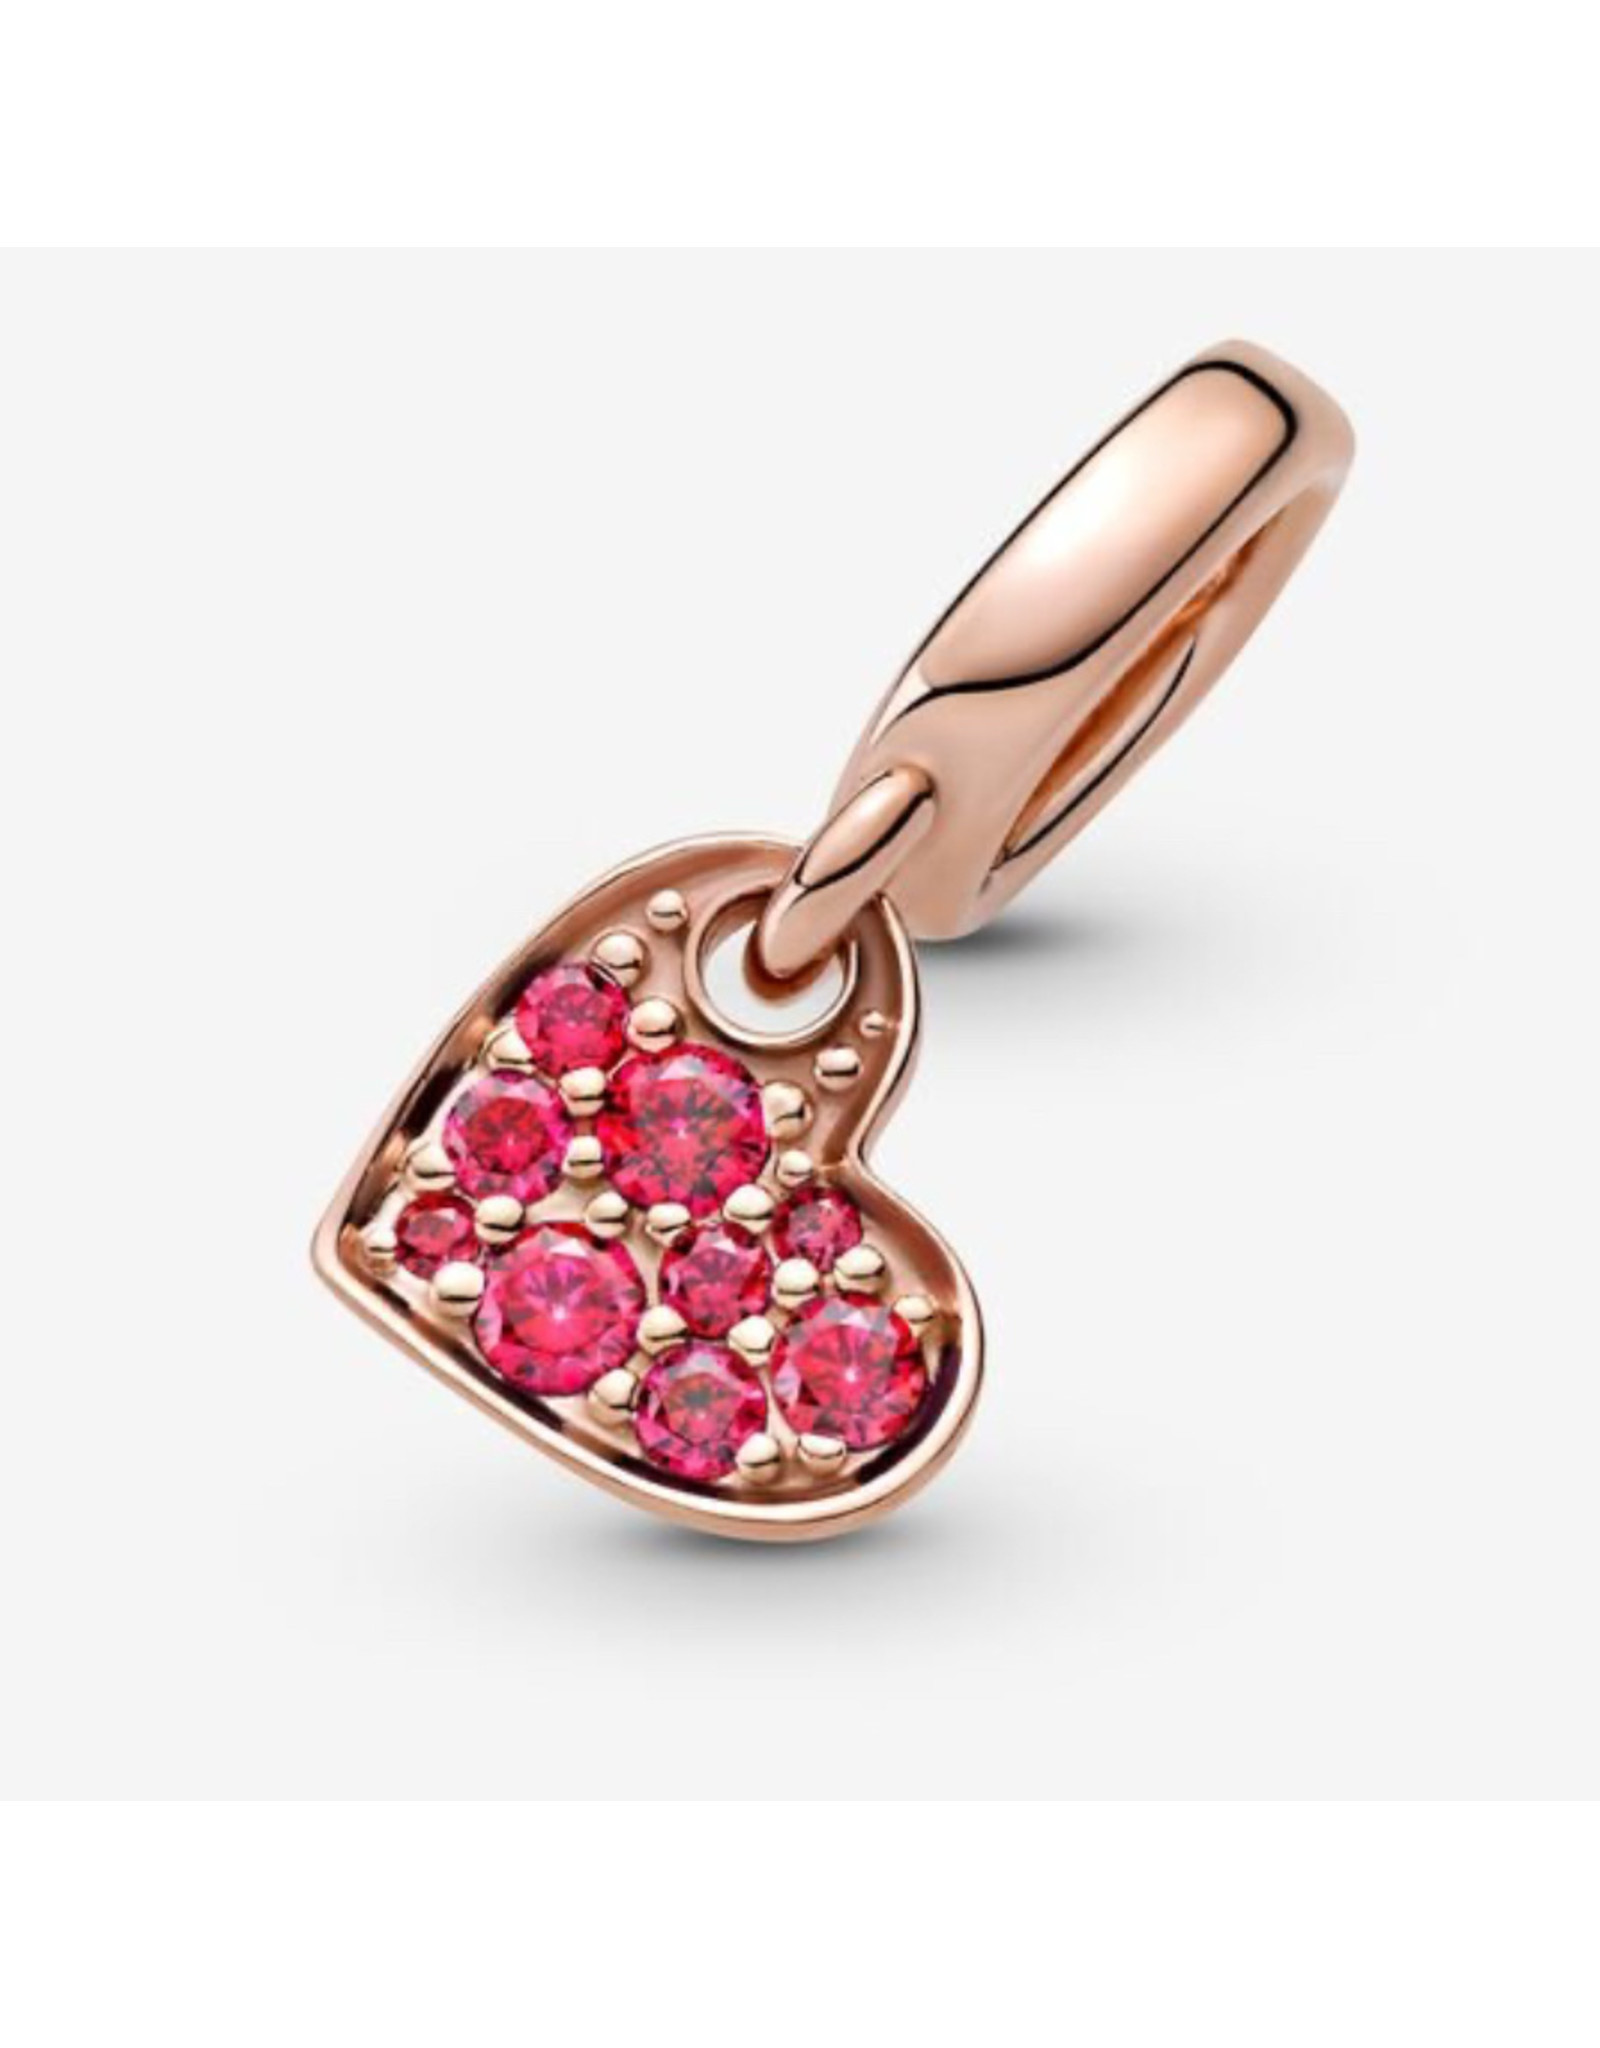 Pandora Pandora Charm,789404C02, Pave Tilted Heart Dangle, Red CZ, Rose Gold